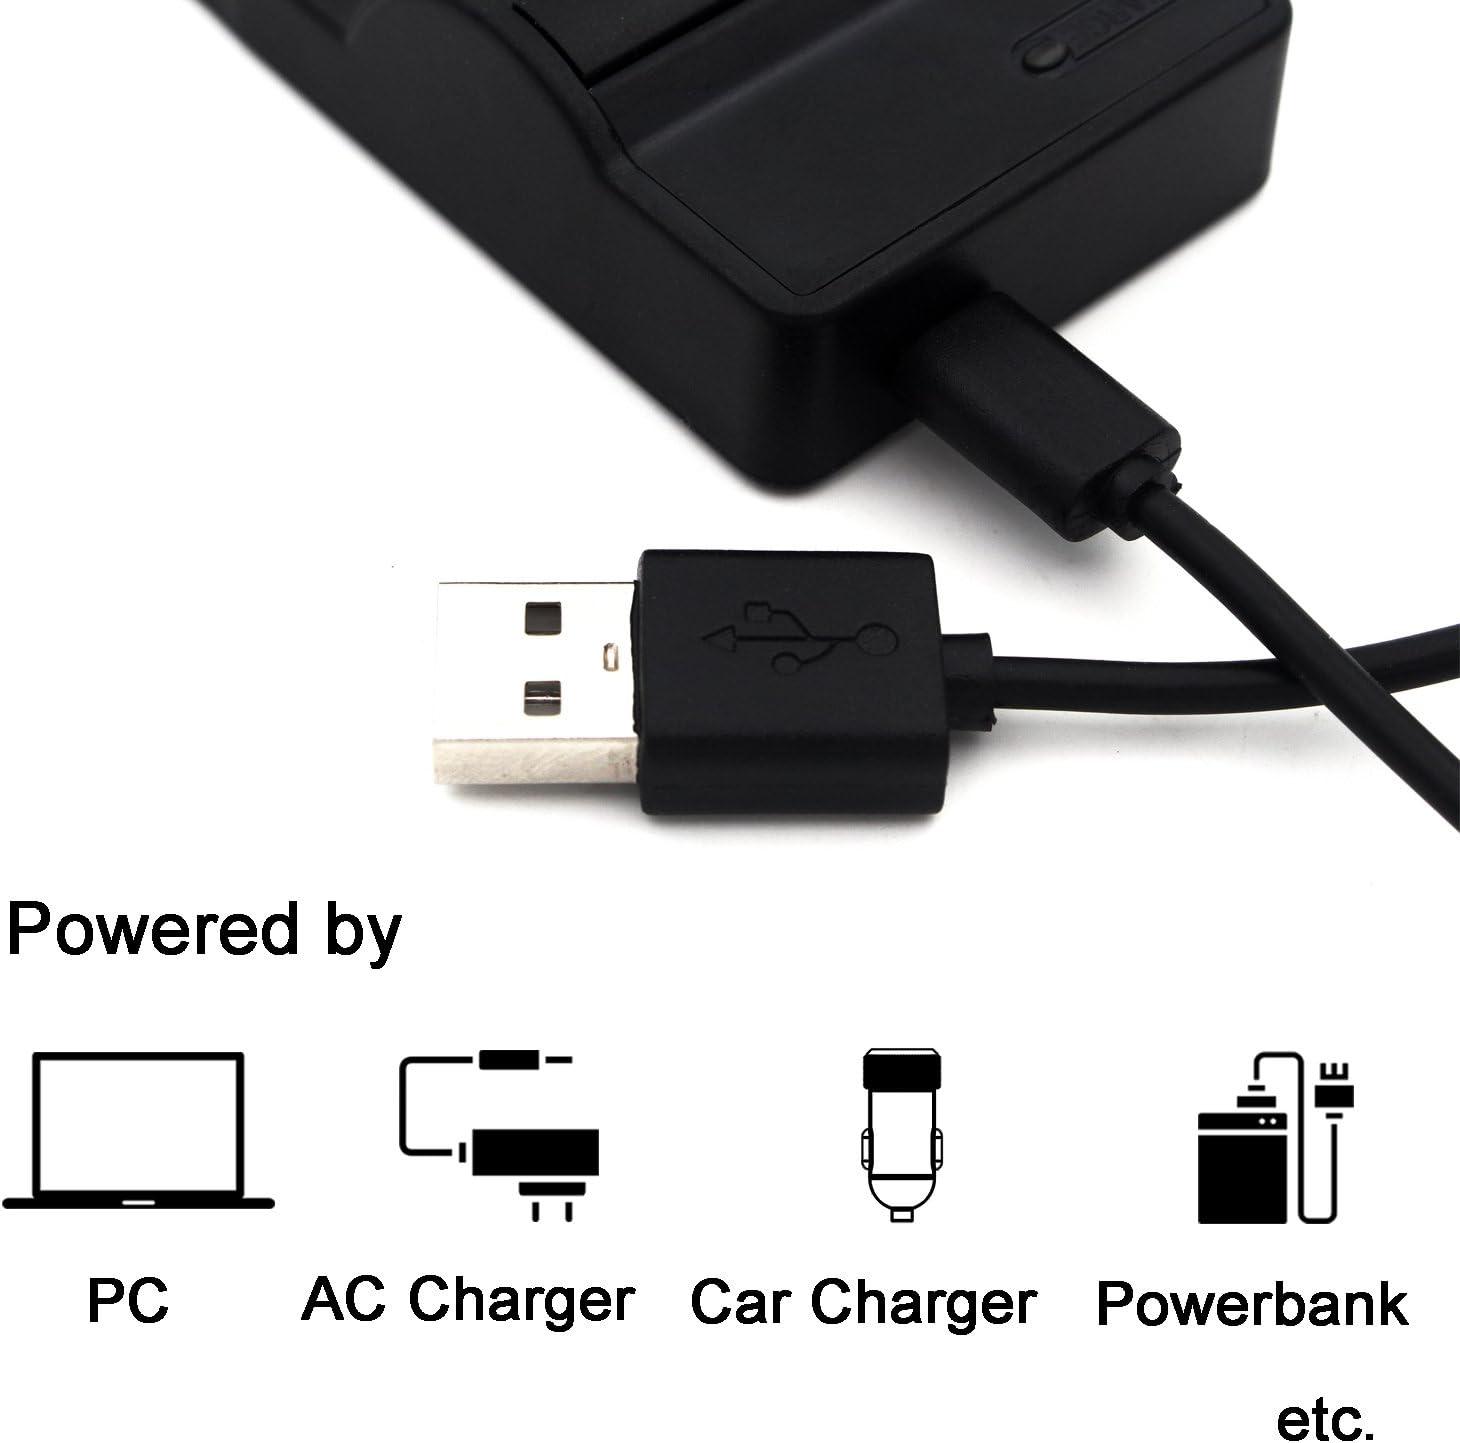 VPC-HD1010 DMX-HD2000 DMX-TH1 VPC-HD1000 VPC-TH1 DMX-HD1010 DMX-HD1000 VPC-HD2000 VPC-TH2 DMX-WH1 VPC-WH1 bater/ía de la c/ámara y M/ás DB-L50 USB Cargador para Sanyo Xacti DMX-FH11